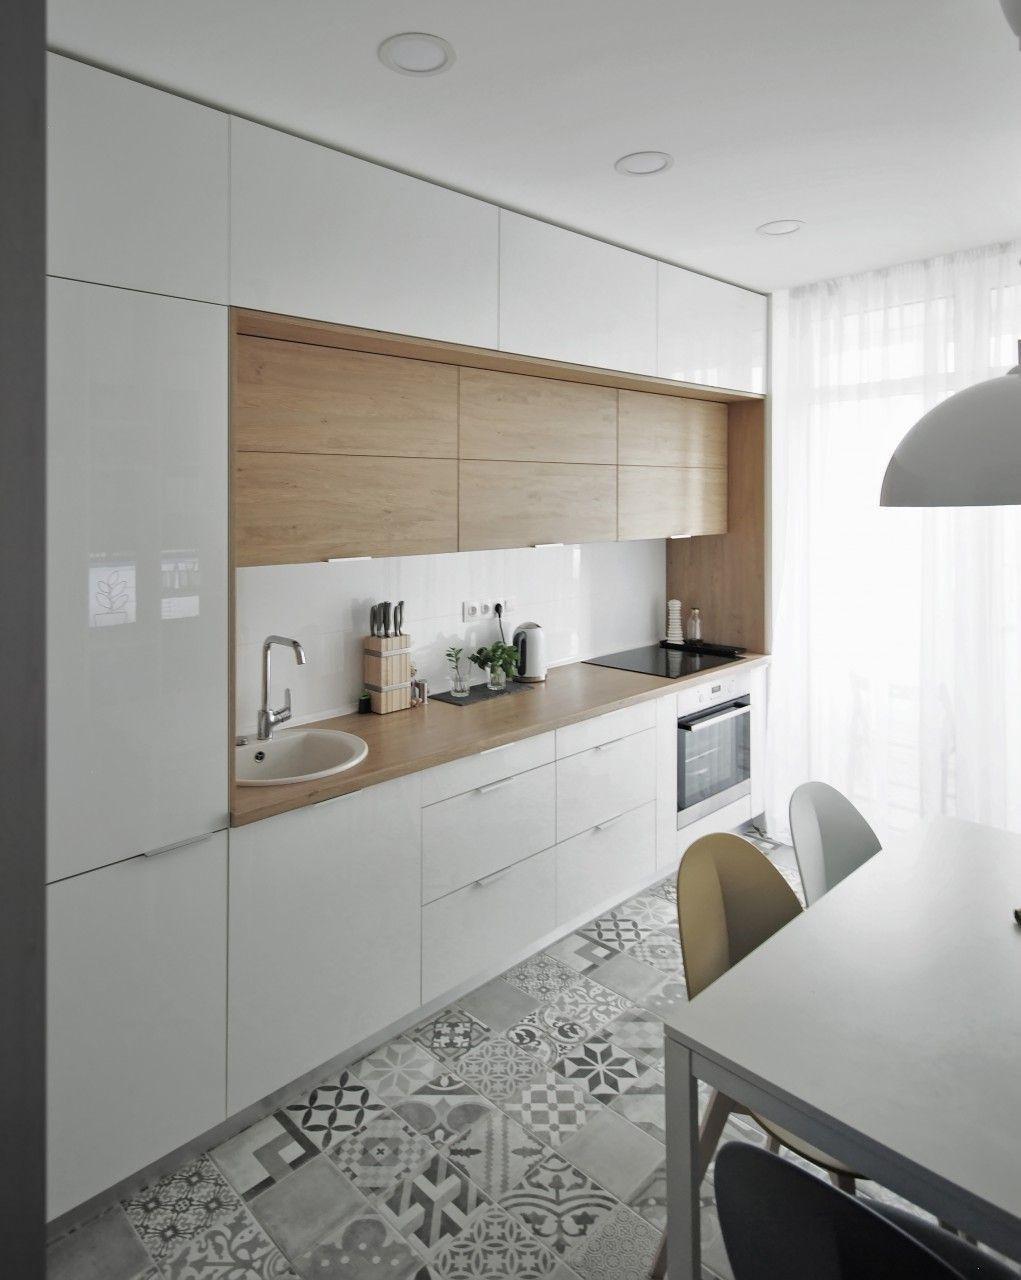 Nice Contemporary Kitchen inspiration. #ContemporaryKitchen #Kitchen #KitchenIdeas #kitchendesigninspiration